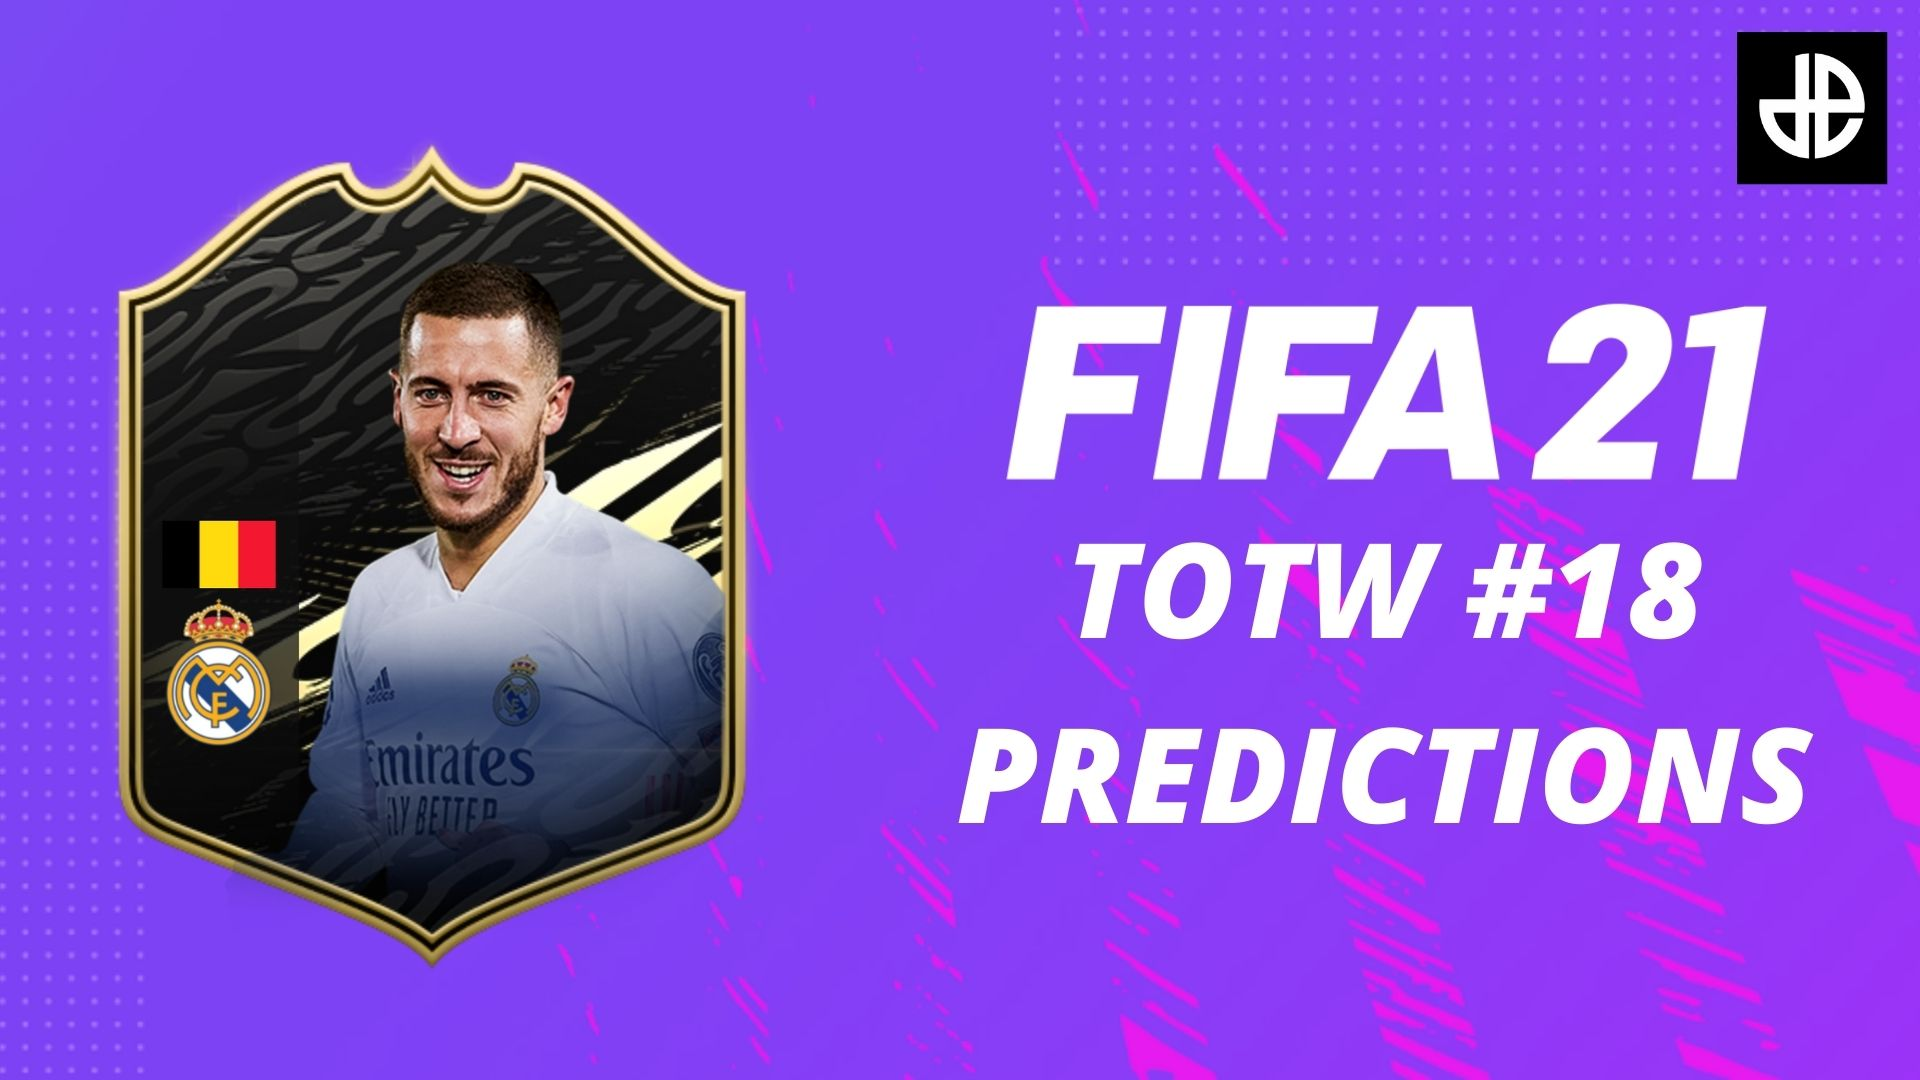 FIFA 21 TOTW 18 Predictions with Eden Hazard card